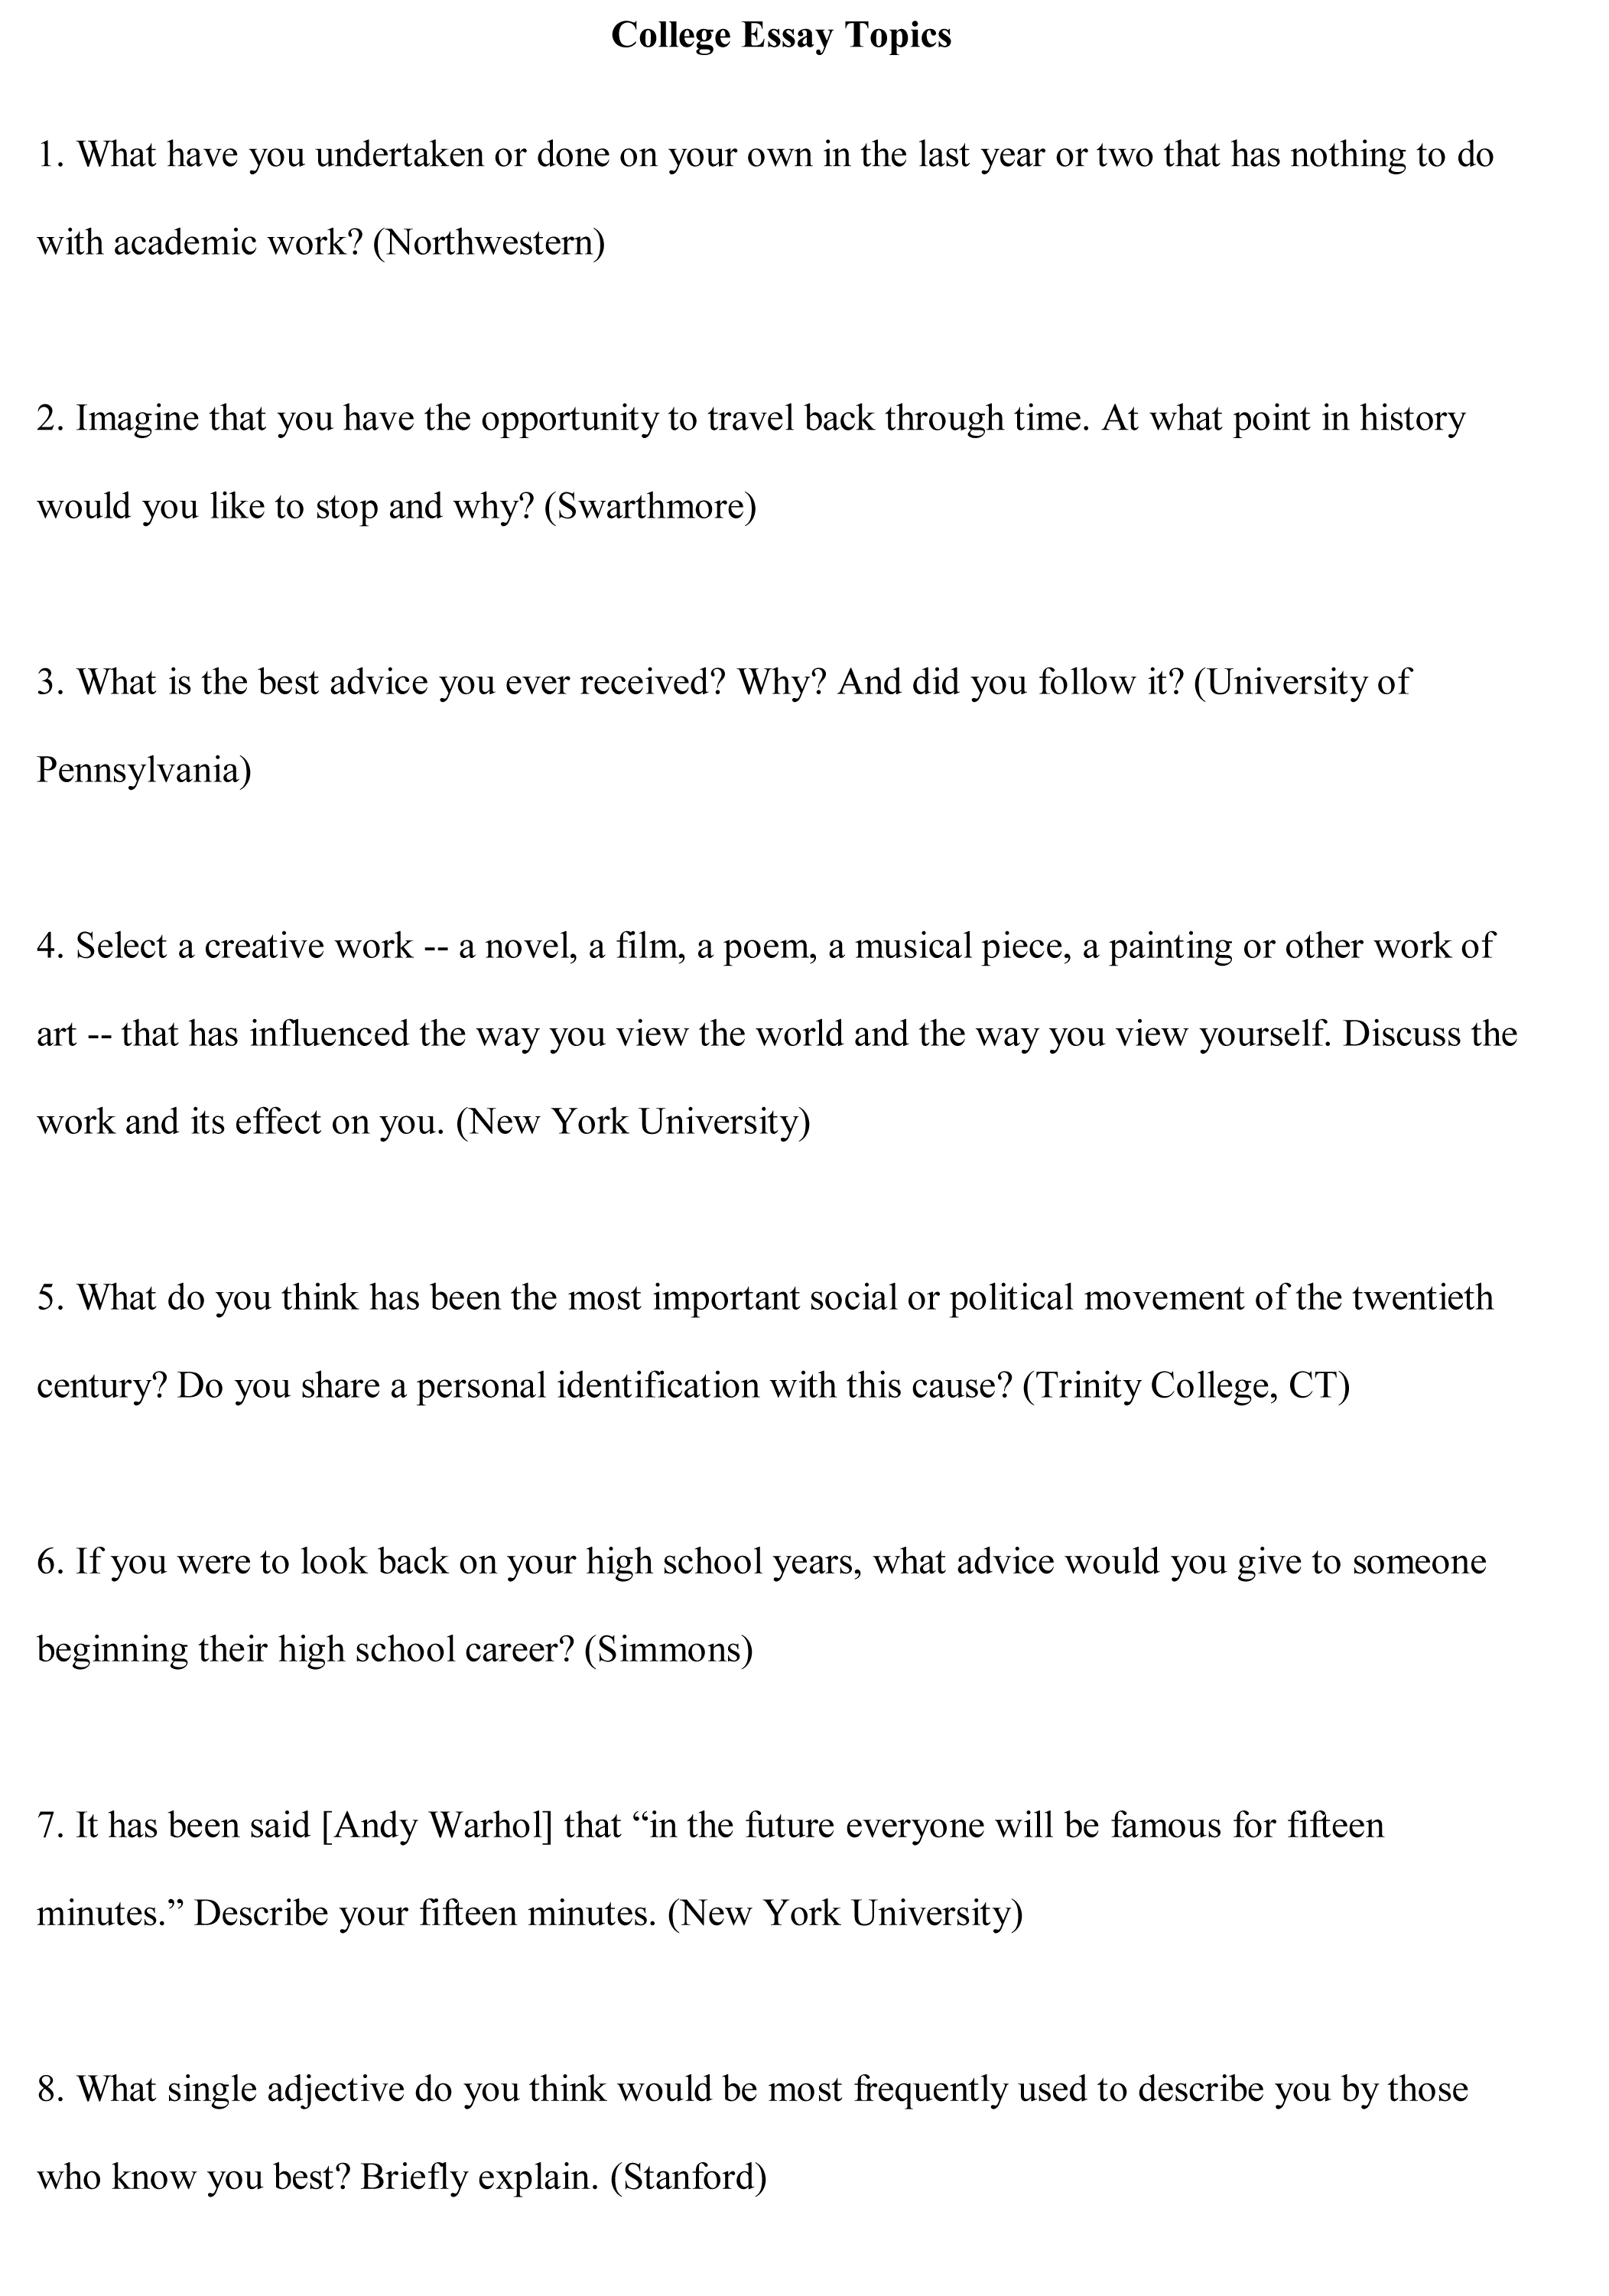 017 College Essay Topics Free Sample1 Good Persuasive Amazing For Argumentative High School Full